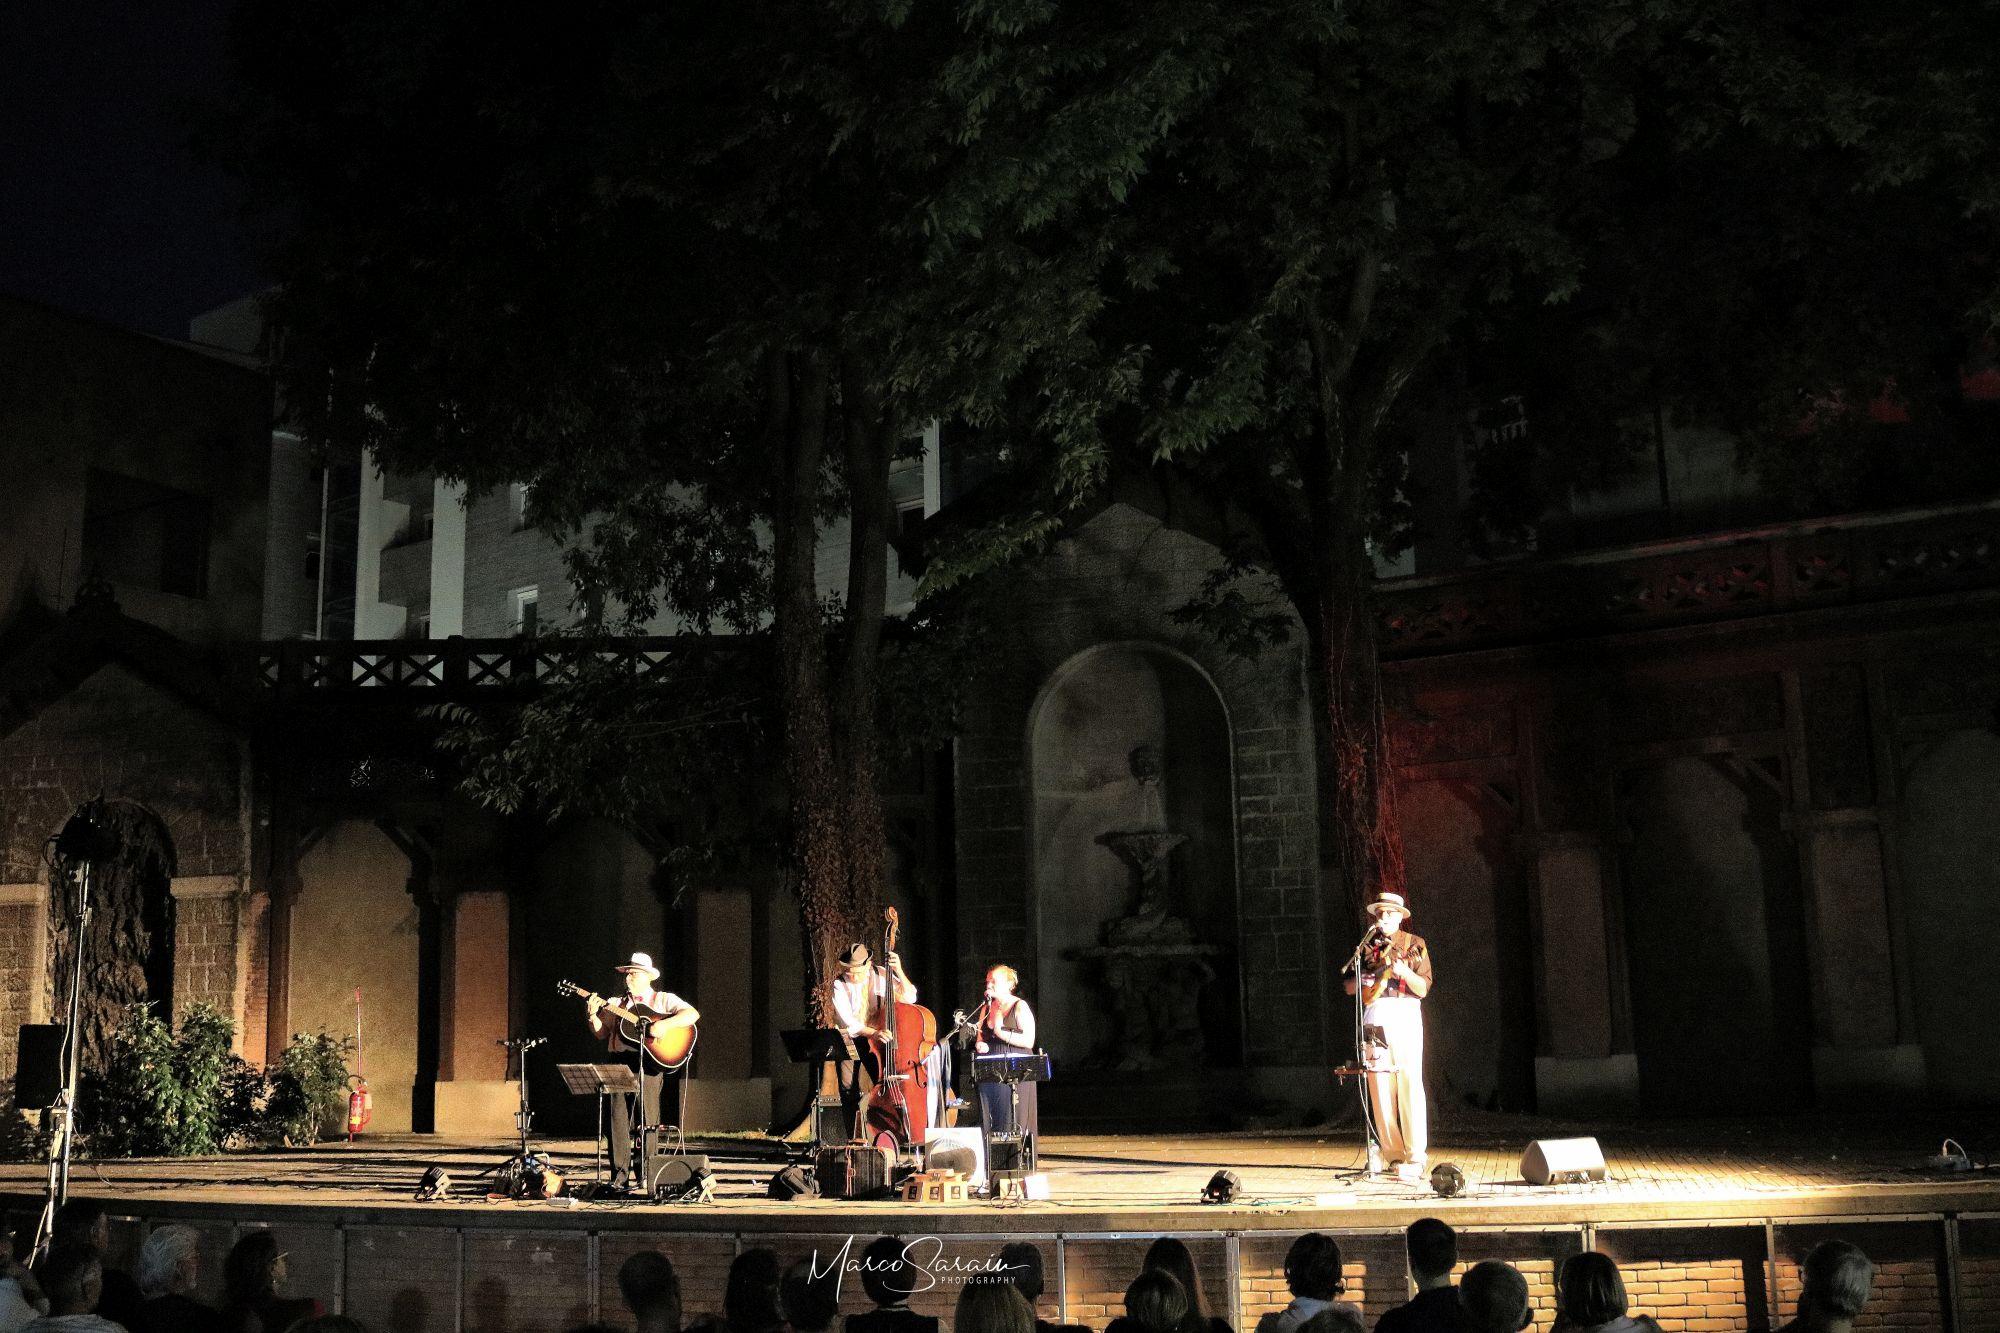 Teatrio' live